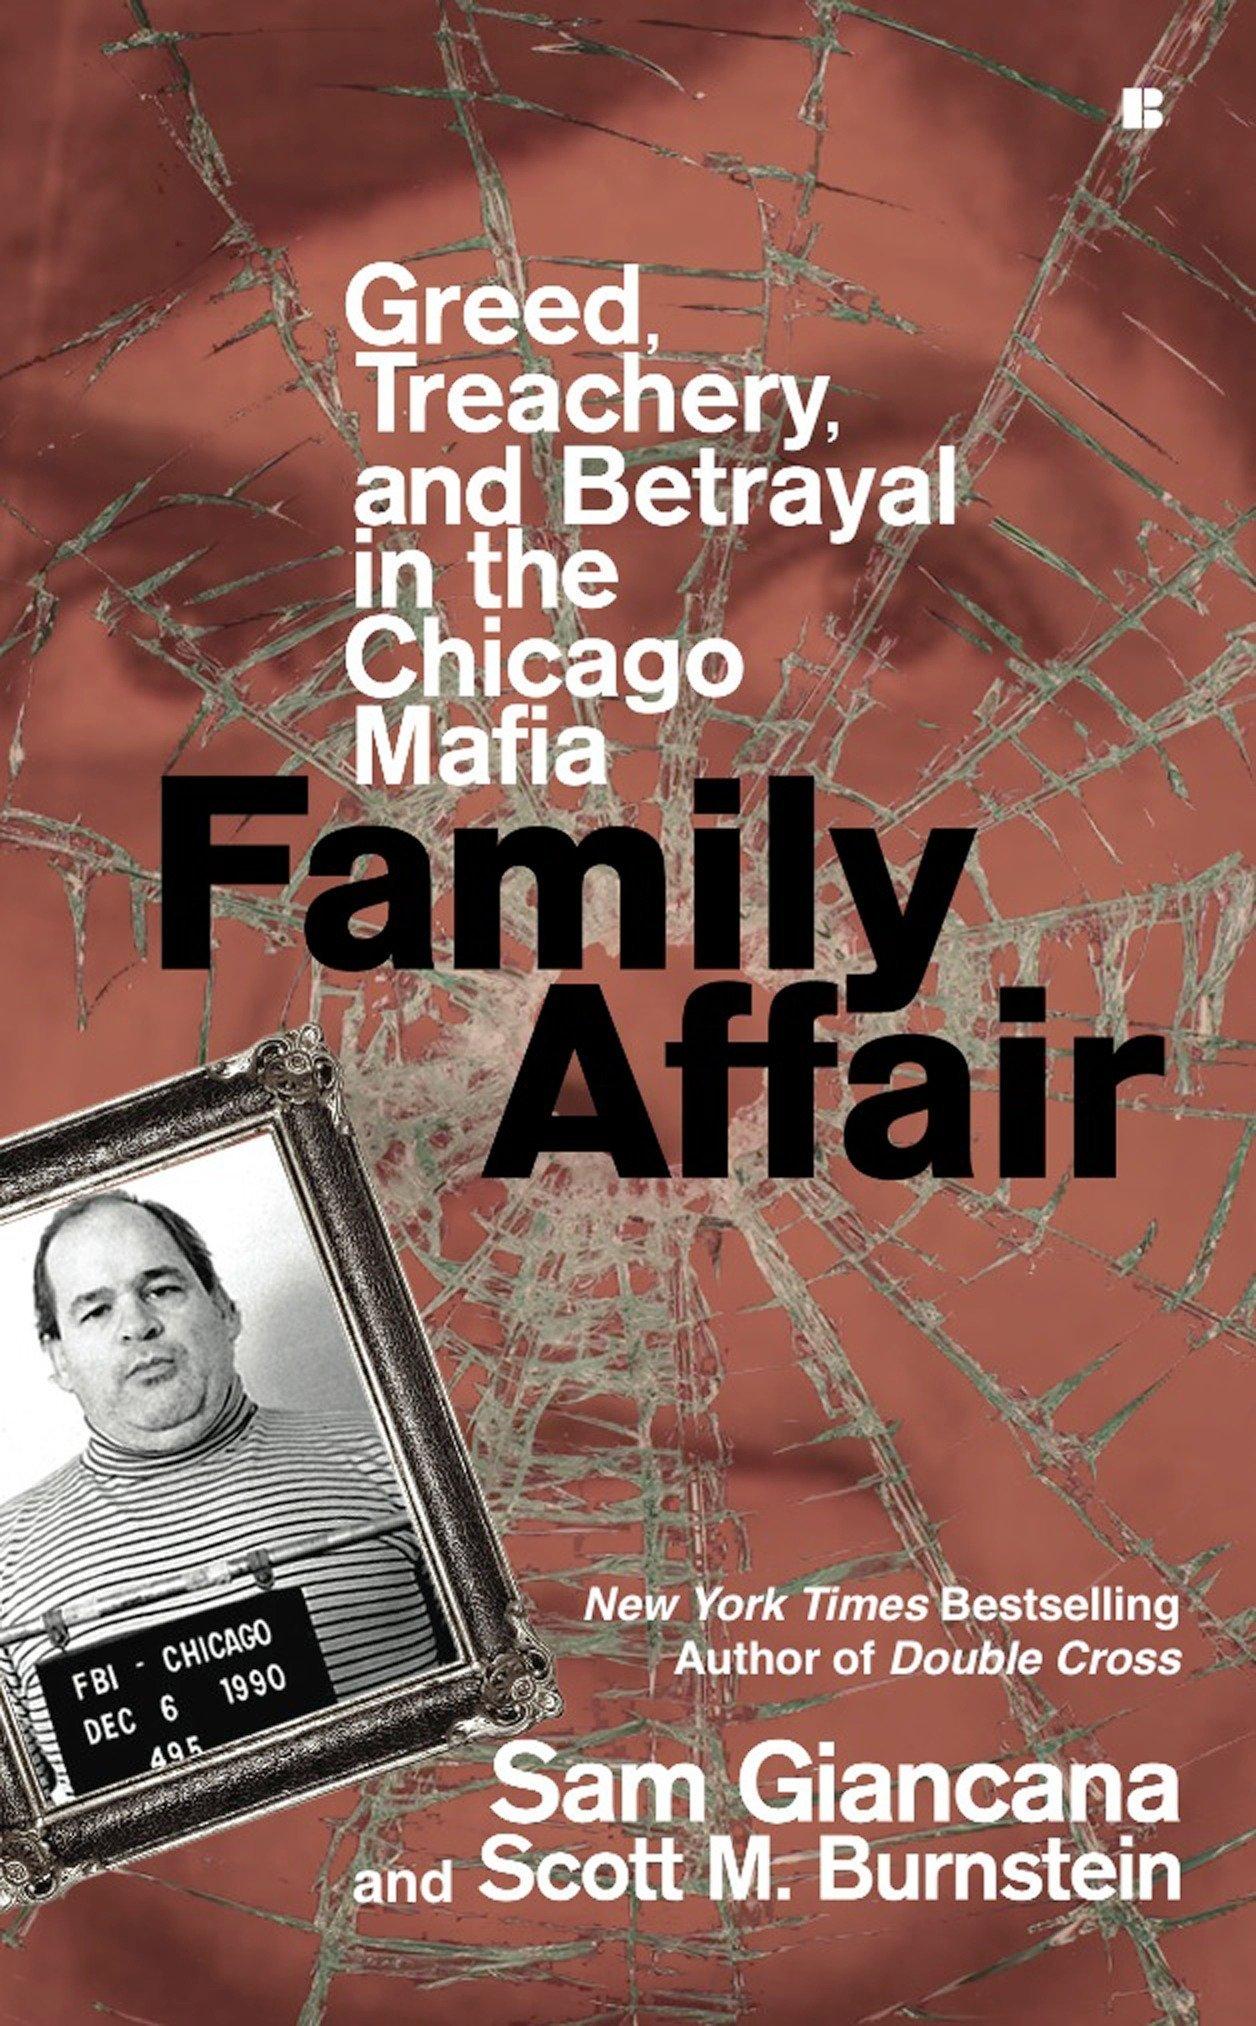 Family Affair: Greed, Treachery, and Betrayal in the Chicago Mafia: Sam  Giancana, Scott M. Burnstein: 9780425228319: Amazon.com: Books